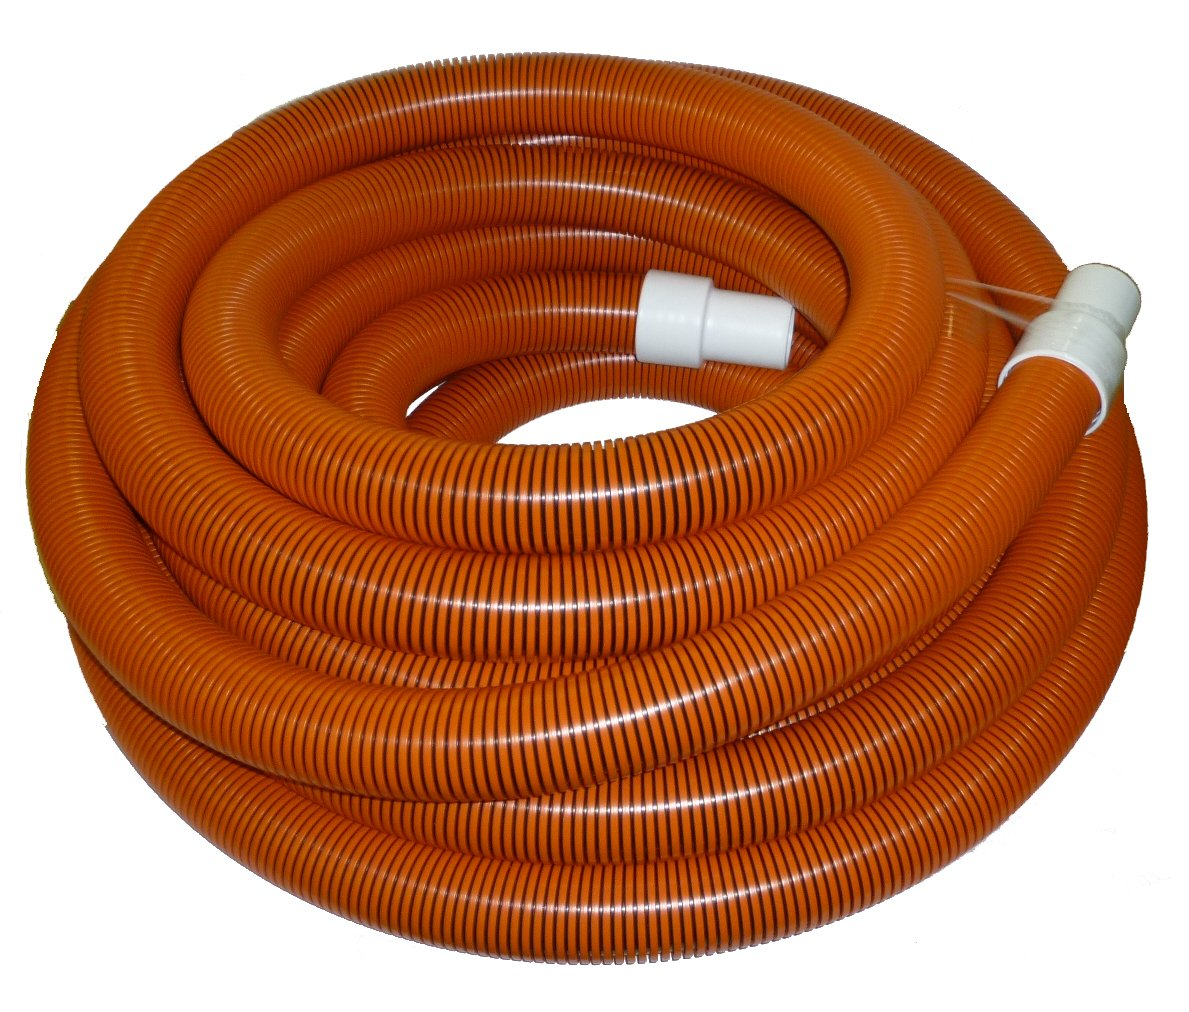 2'' x 50' Orange/Black I-Helix Commercial TM Vacuum Hose with White Cuffs